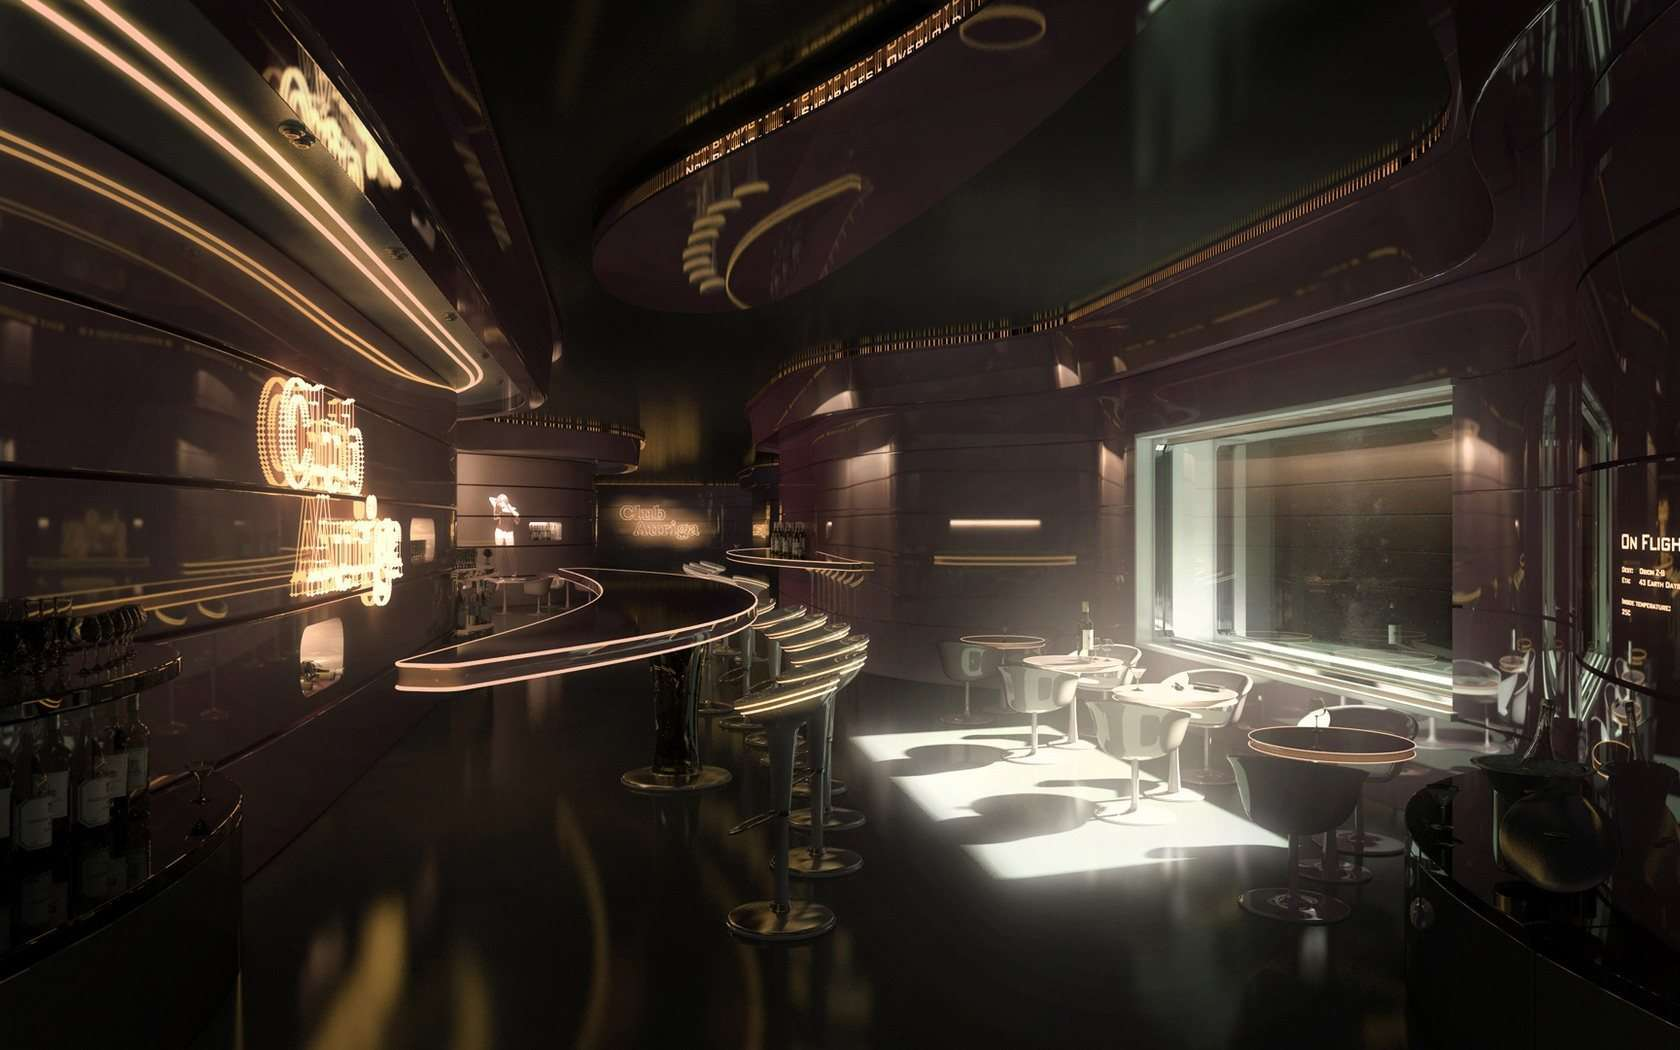 HD Wallpaper Pub 1680x1050